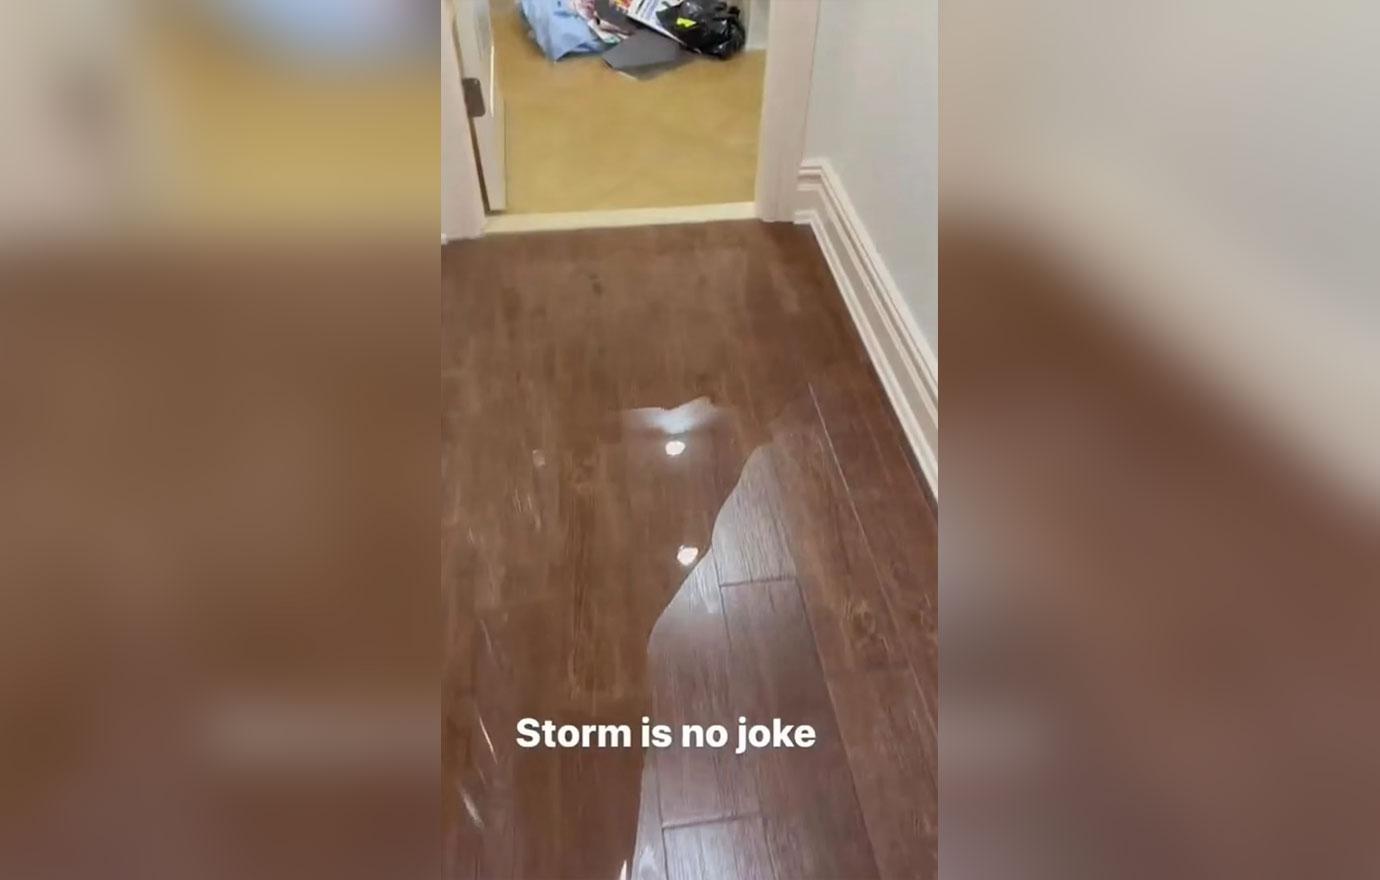 cardi b mostra que a casa dela foi inundada